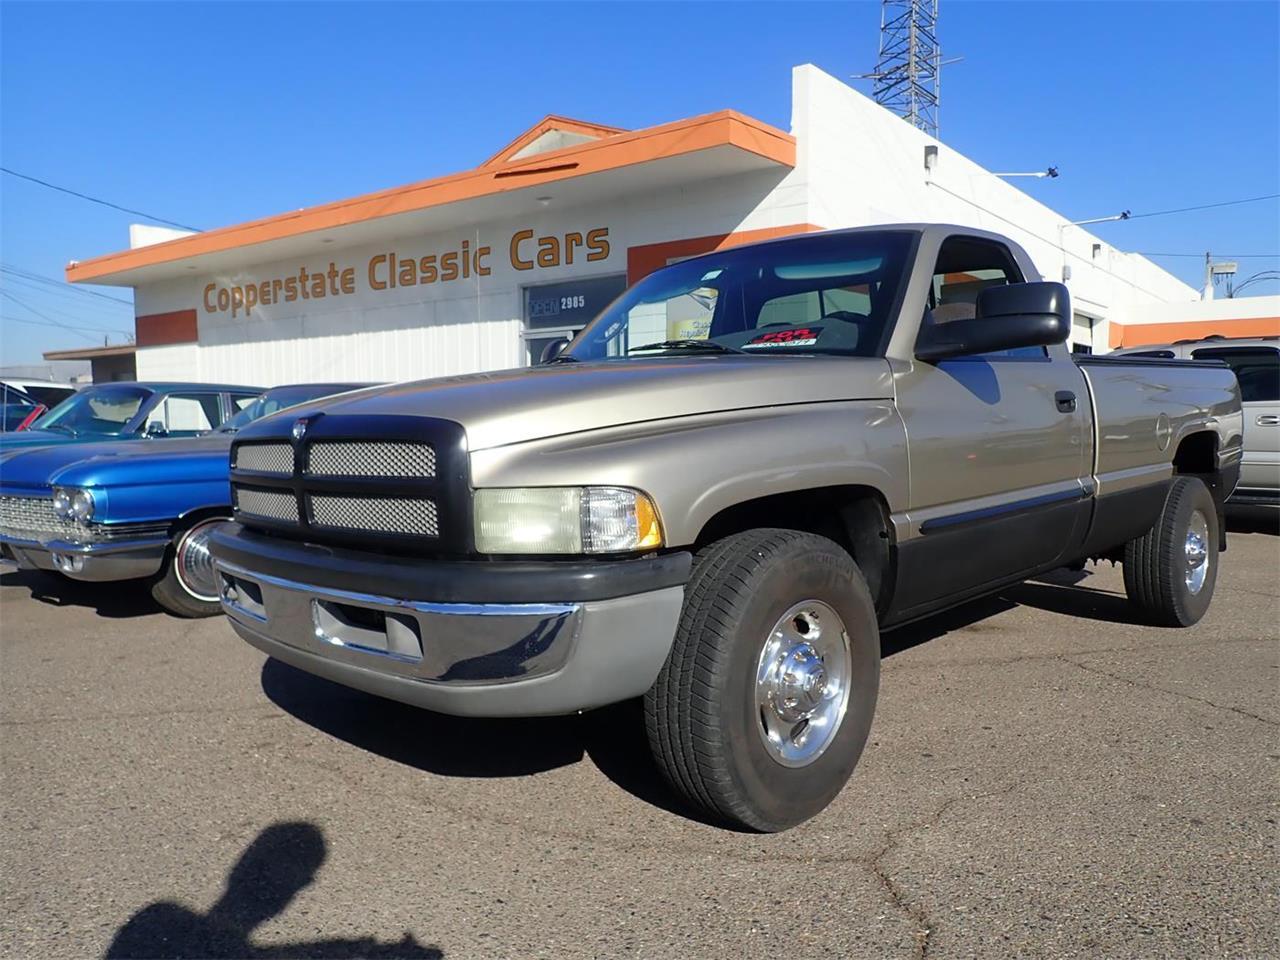 2002 Dodge Ram 2500 (CC-1296886) for sale in Phoenix, Arizona